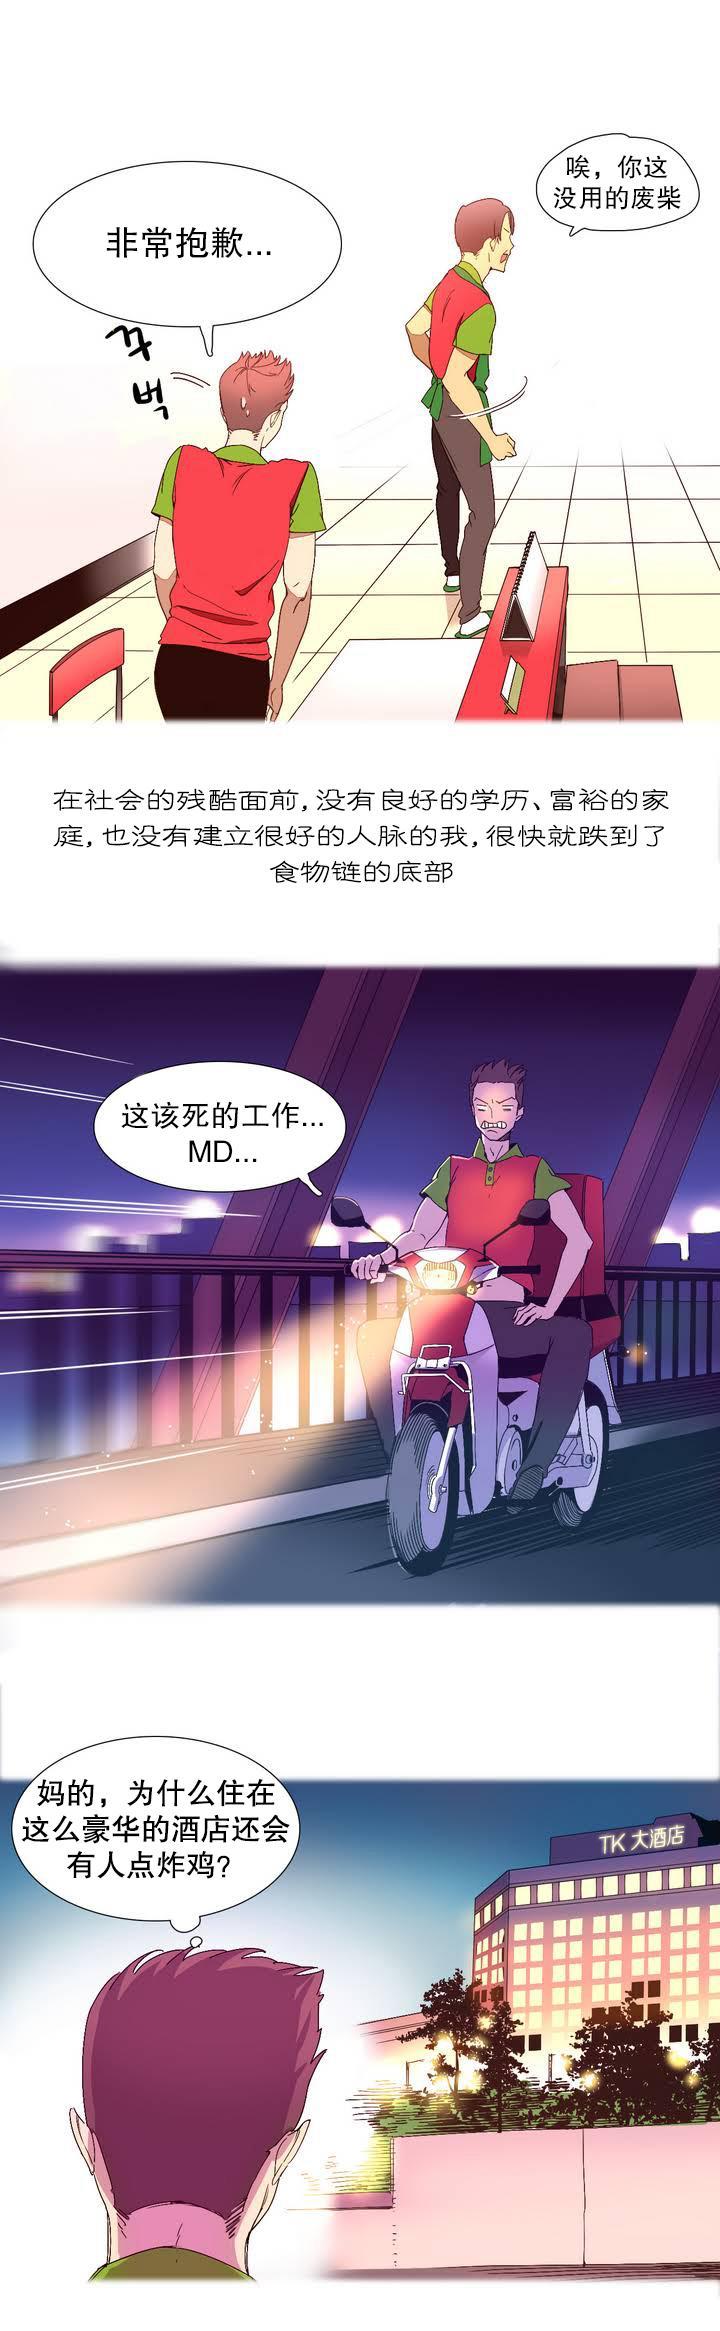 [Rozer] 一个由我统治的世界(A World that I Rule) Ch.1-3 [Chinese] 14